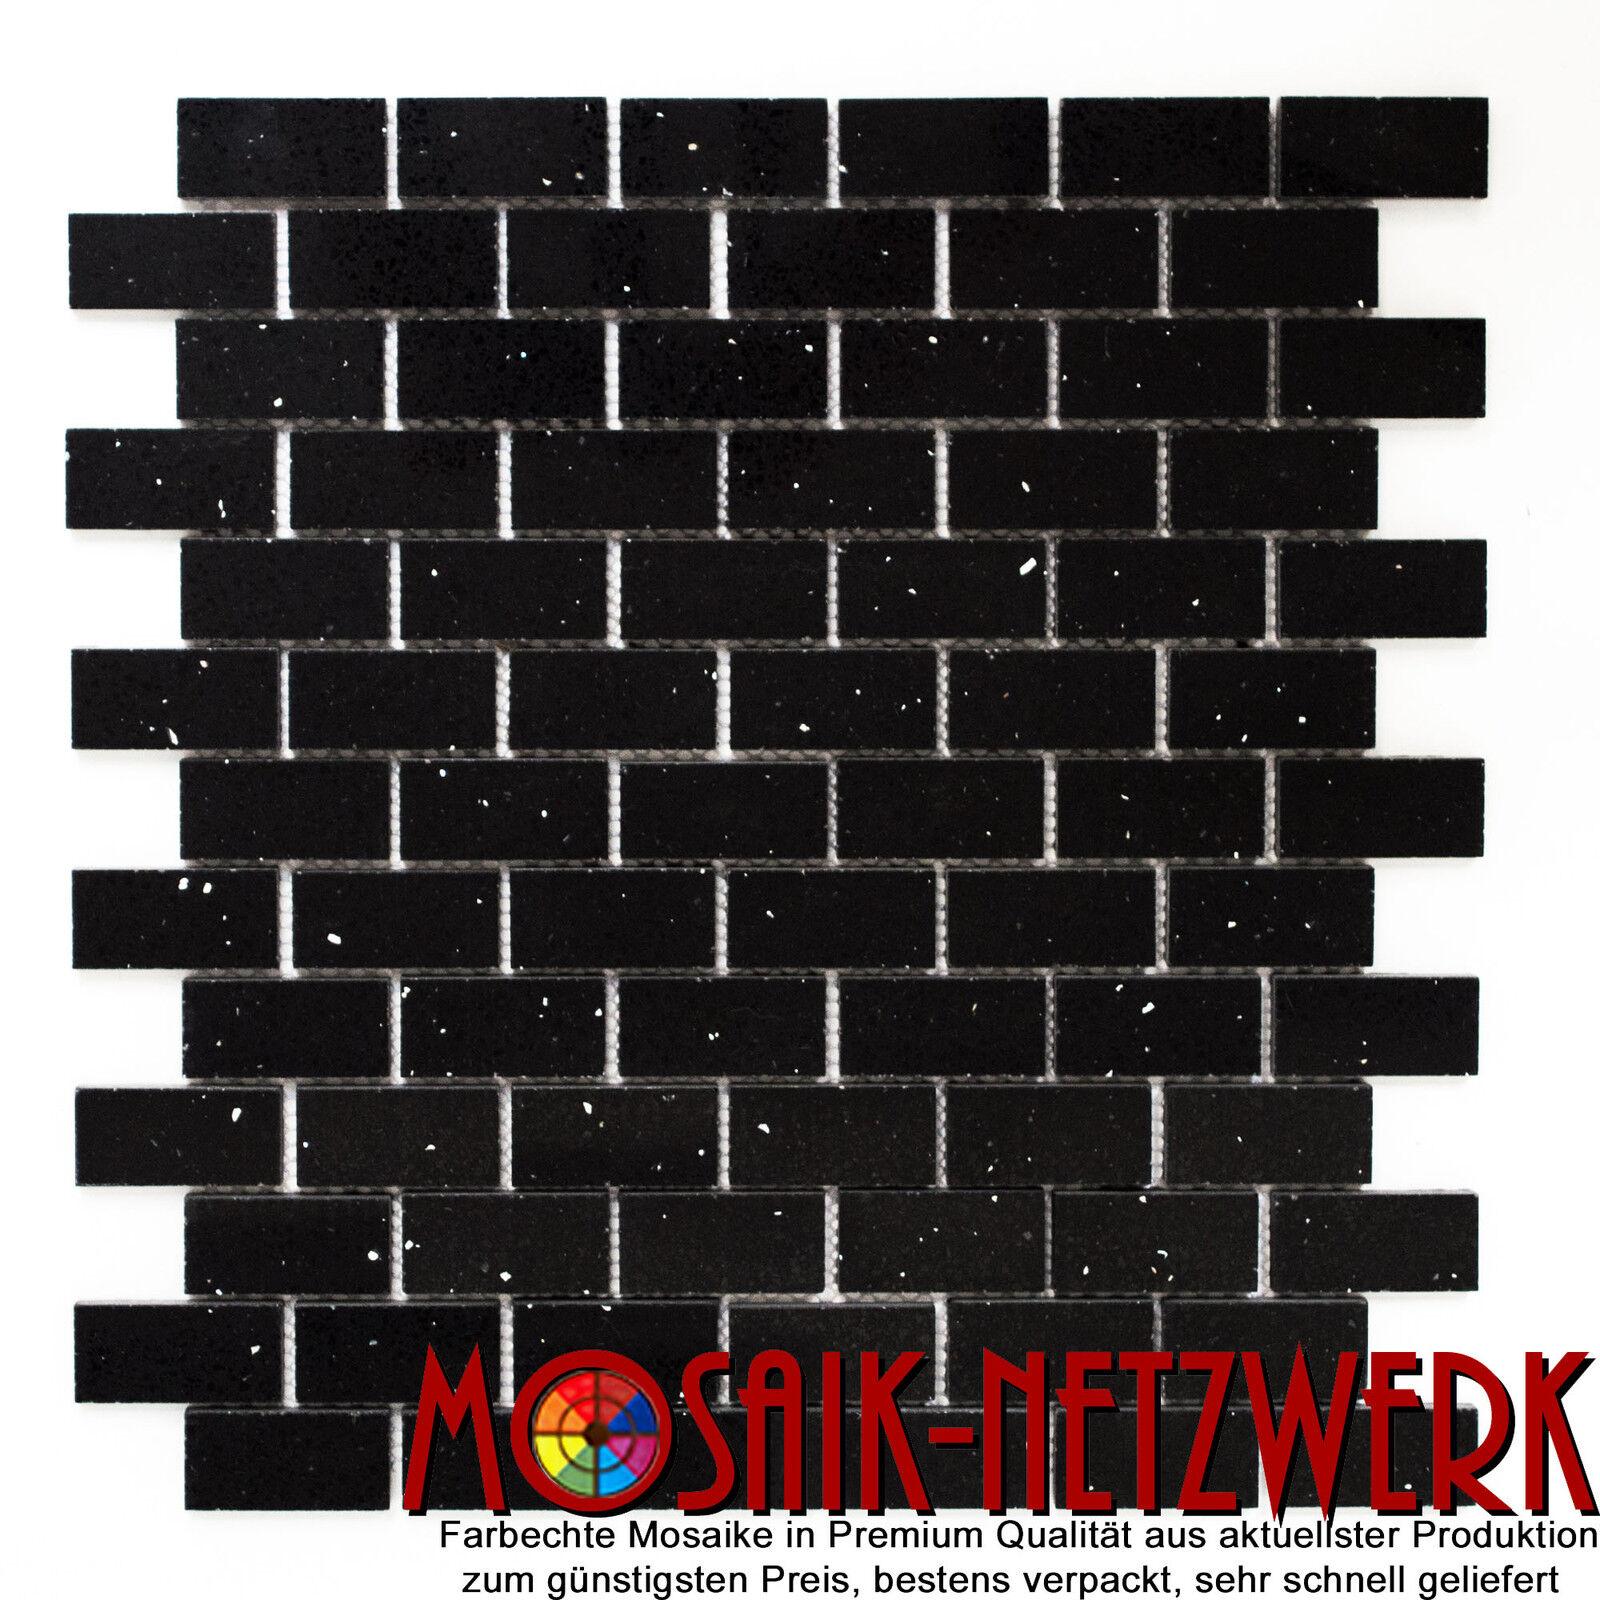 Mosaik Verbund artifical schwarz Fliesenspiegel Küche Art  46-0304   10 Bögen